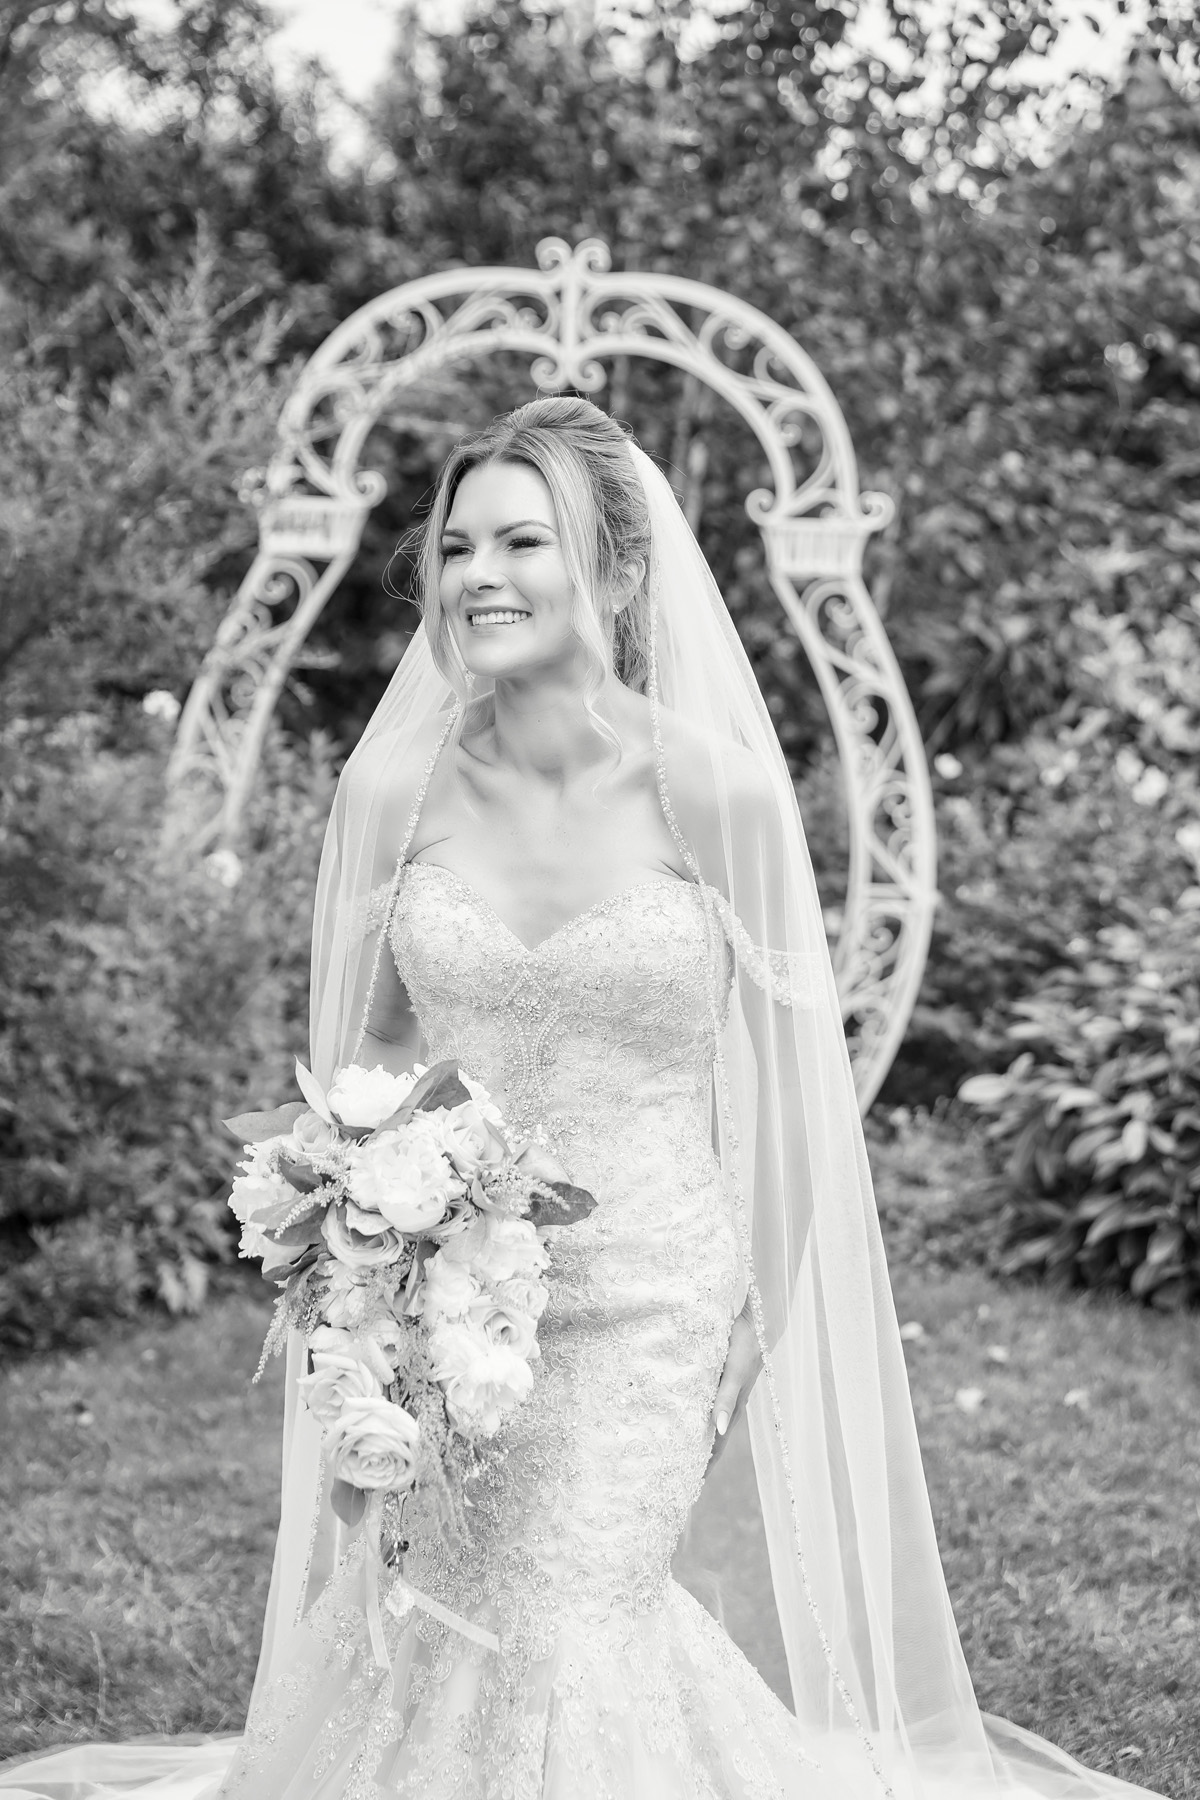 Black & White bridal portrait at Warwick house